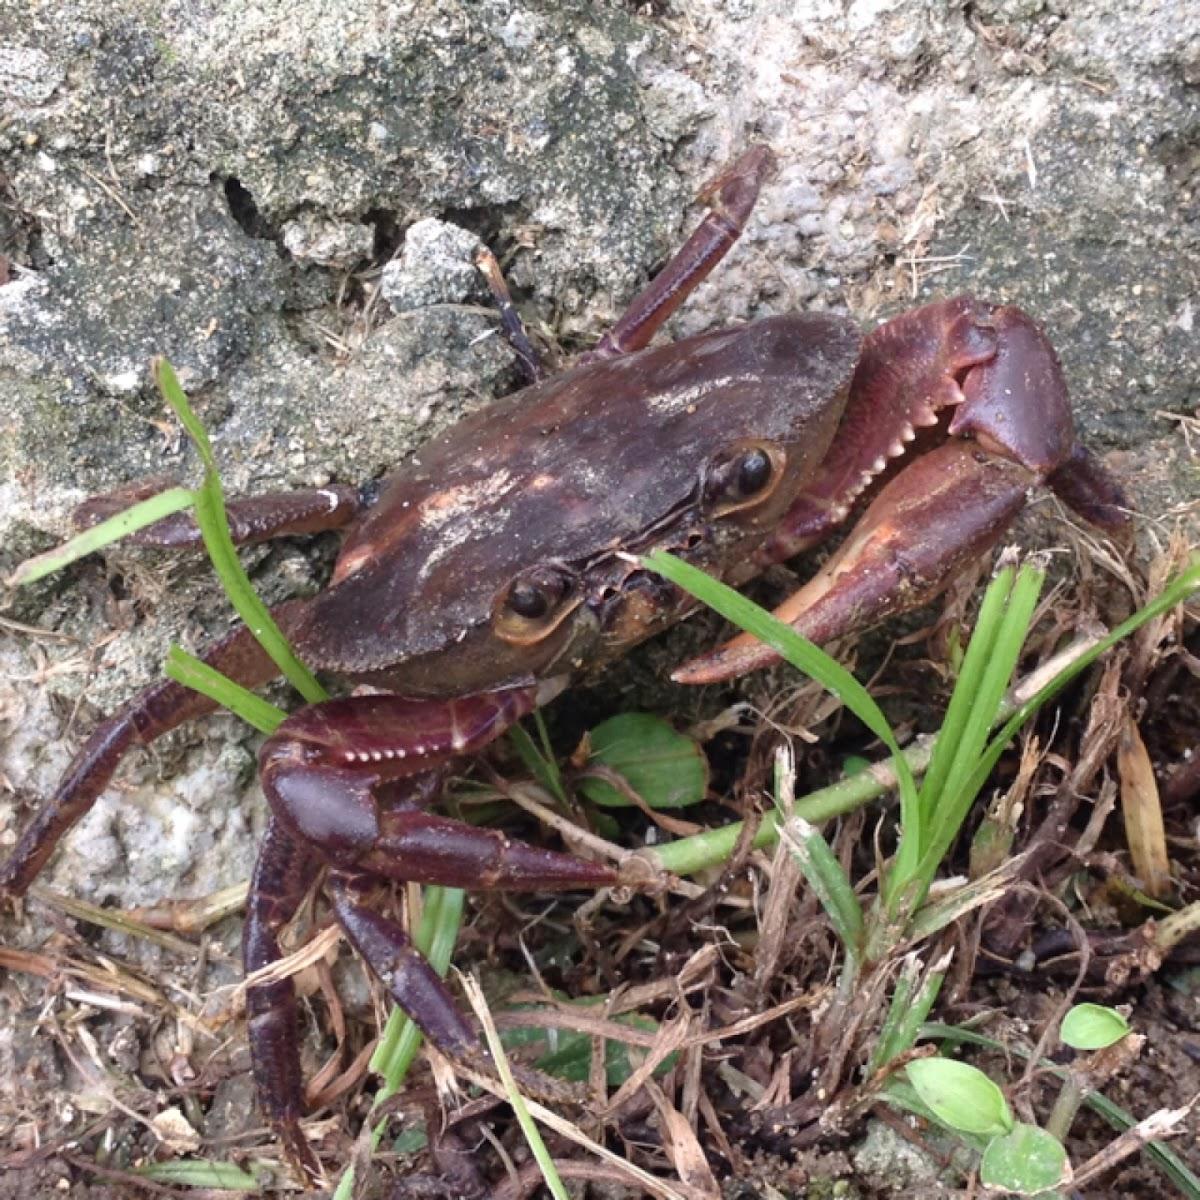 Land Crab Bruquena